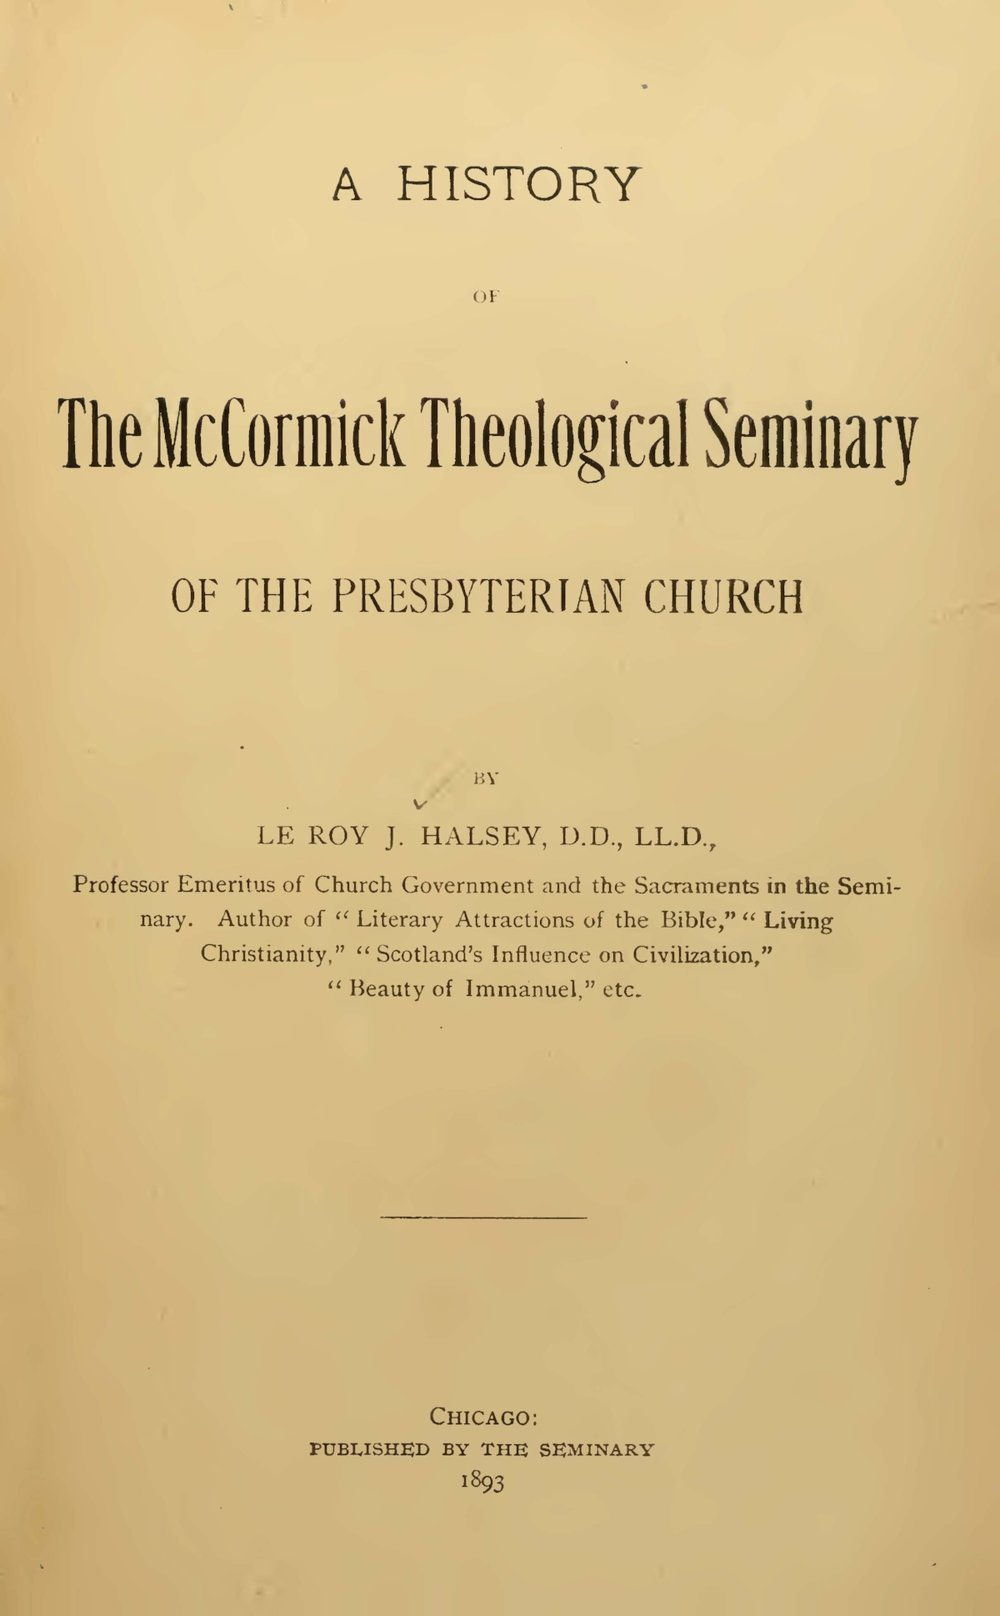 Halsey, Leroy Jones, A History of the McCormick Theological Seminary of the Presbyterian Church Title Page.jpg